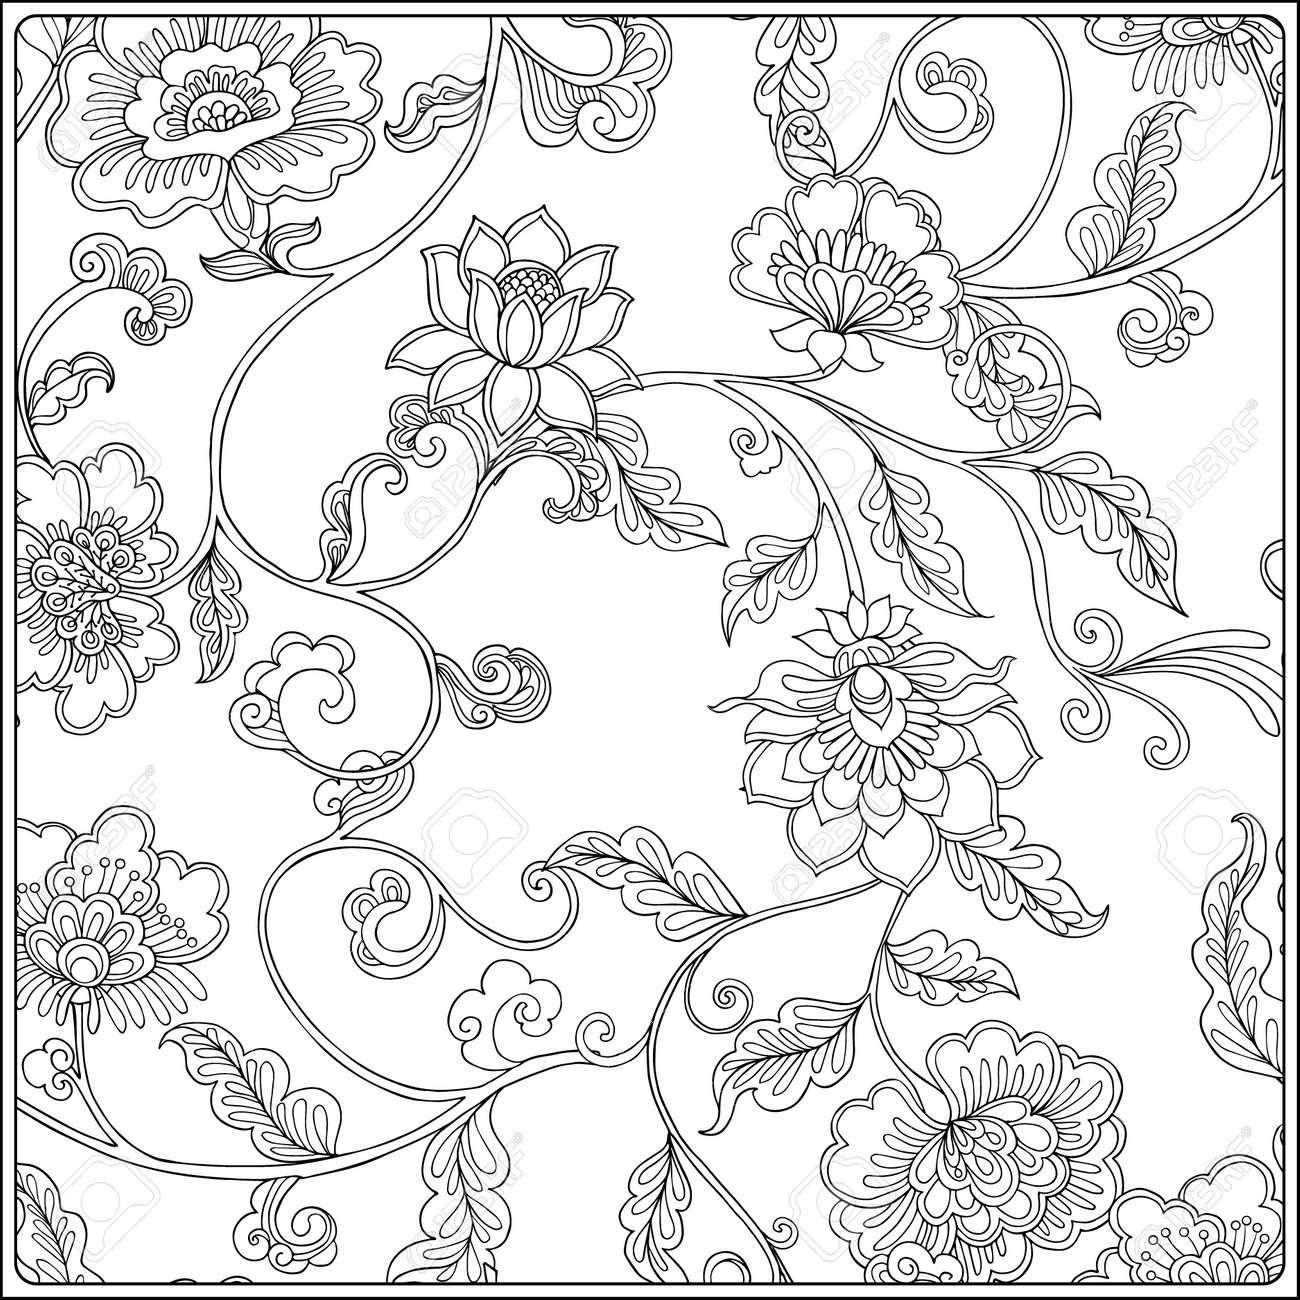 Vintage Floral Pattern Outline Drawing Coloring Book For Adult